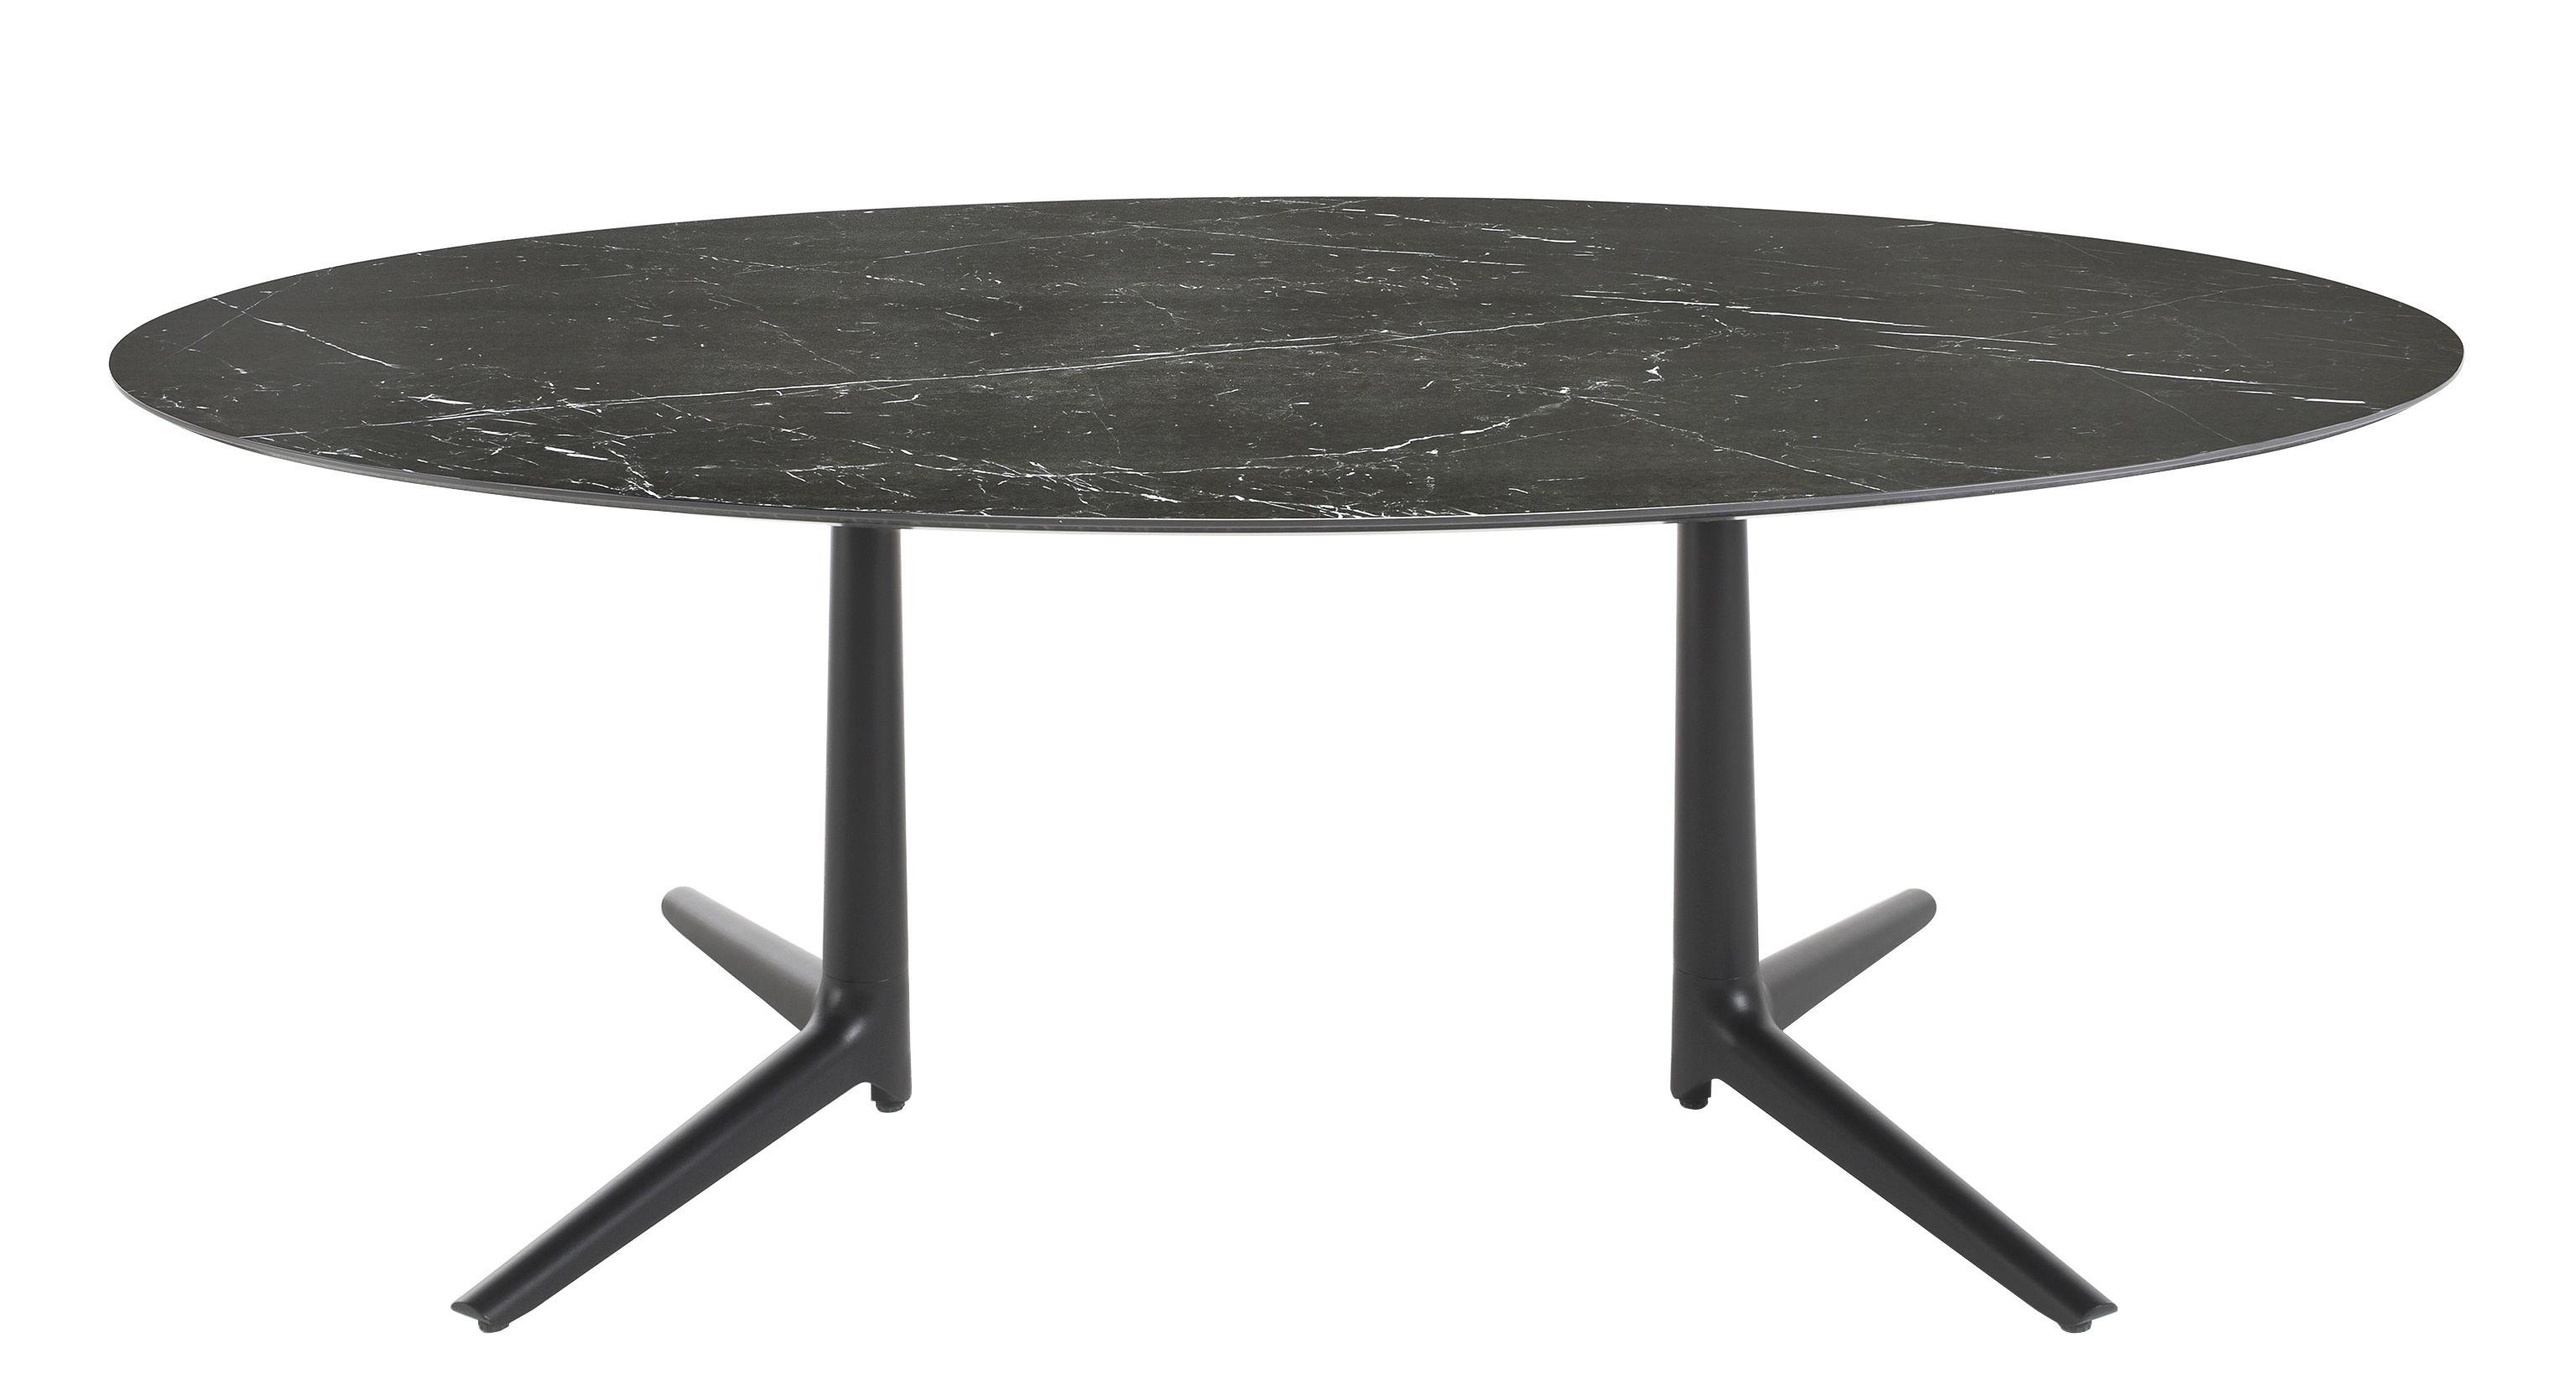 Mobilier - Tables - Table ovale Multiplo indoor - Effet marbre / 192 x 118 cm - Kartell - Noir - Aluminium verni, Grès cérame effet marbre